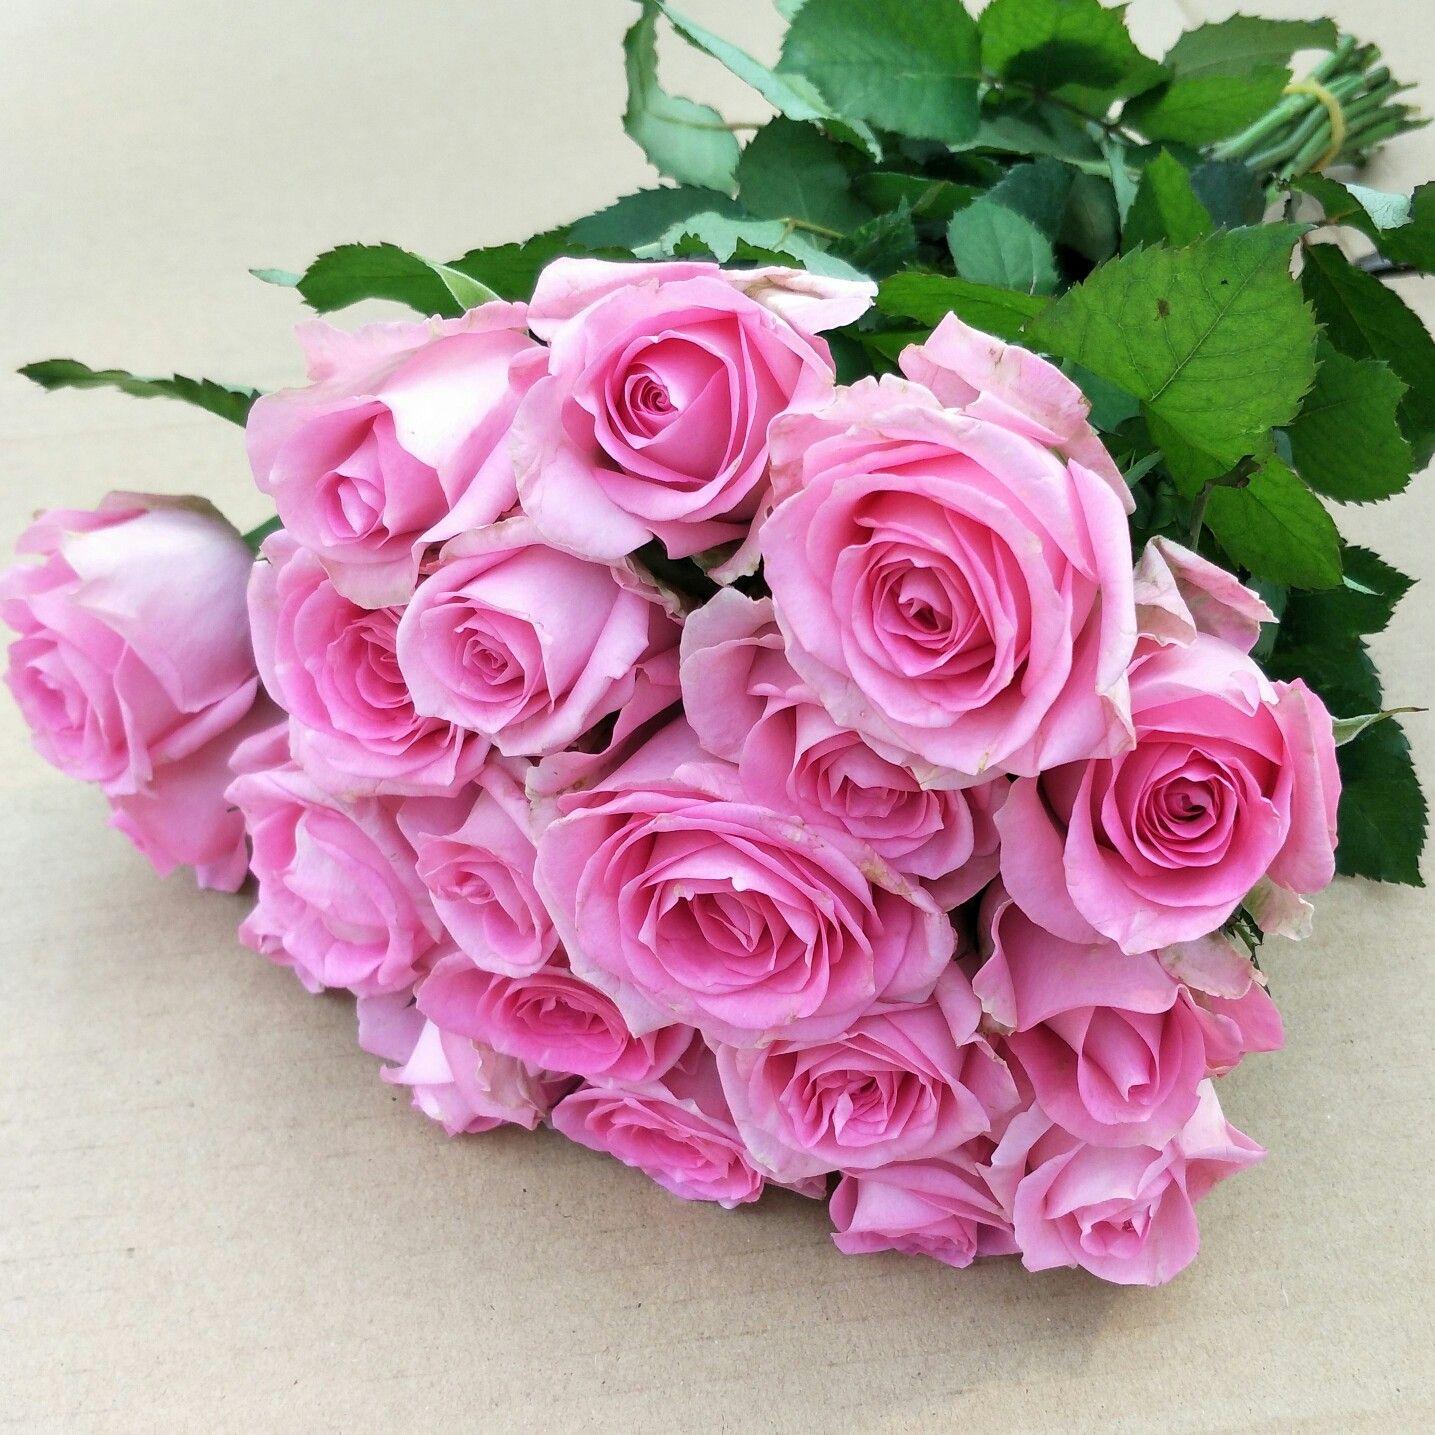 Pink roses rosesflower happy birthday pinterest flowers pink roses rosesflower izmirmasajfo